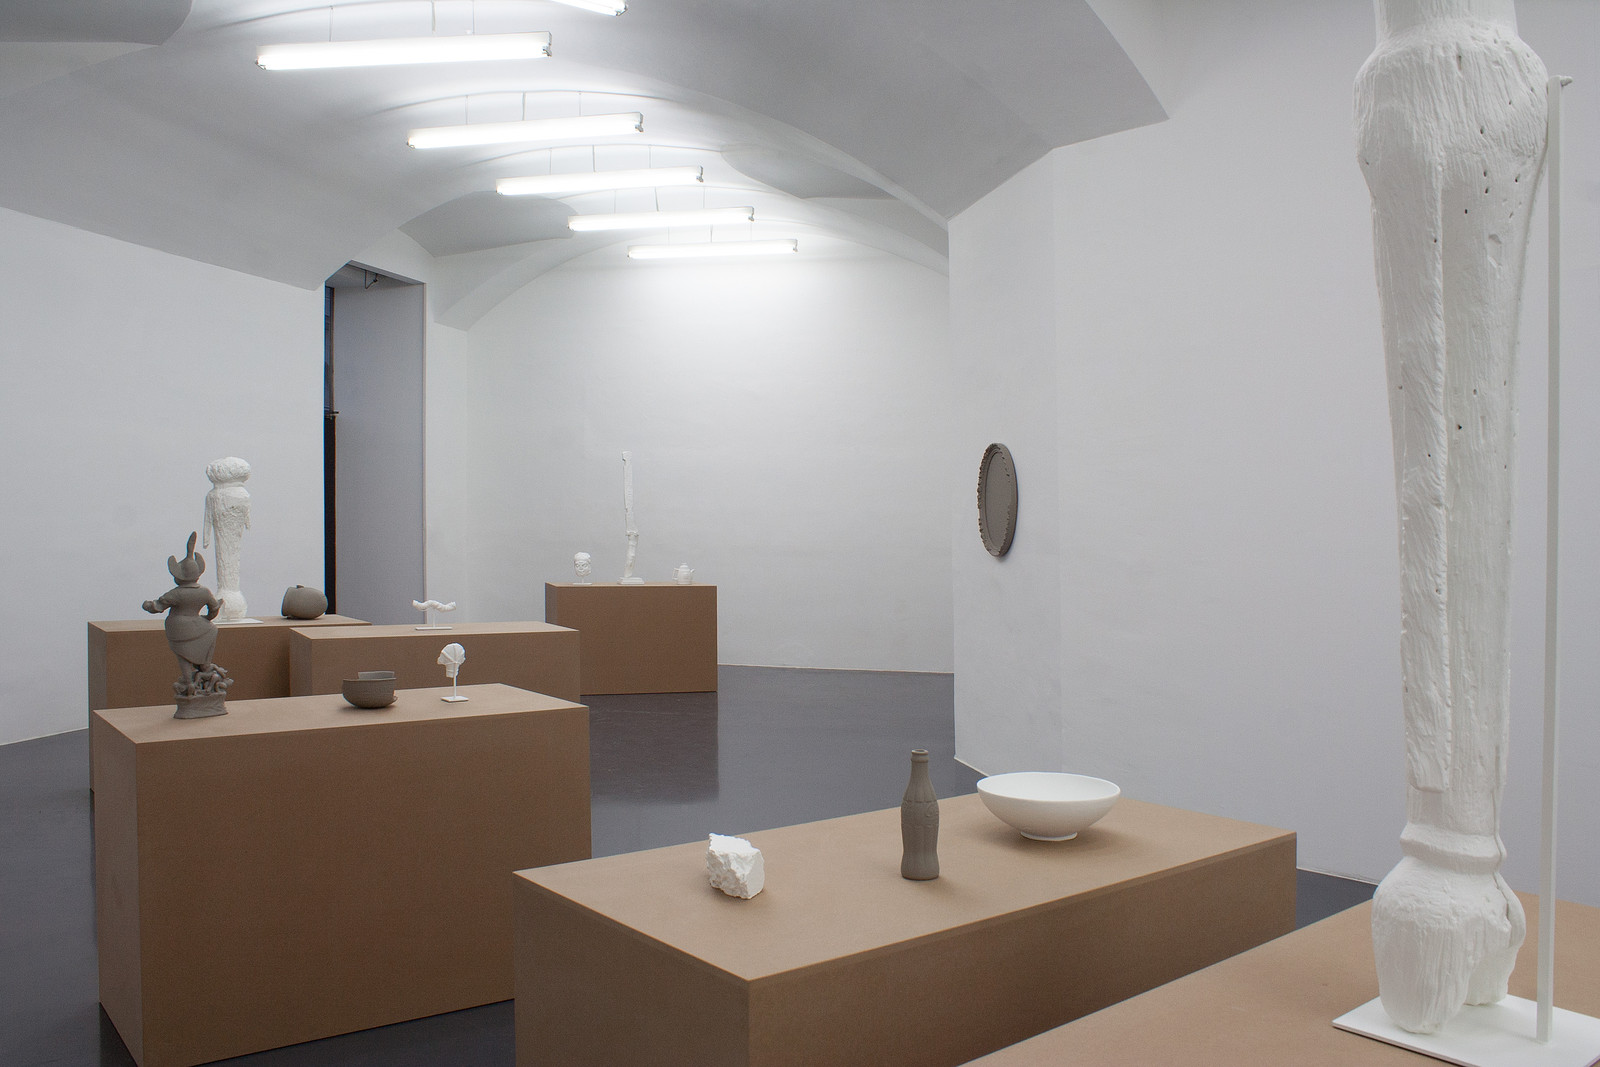 17 Gaylen Gerber exhibition Galerie Emanuel Layr Wien 2016 IMG_8350